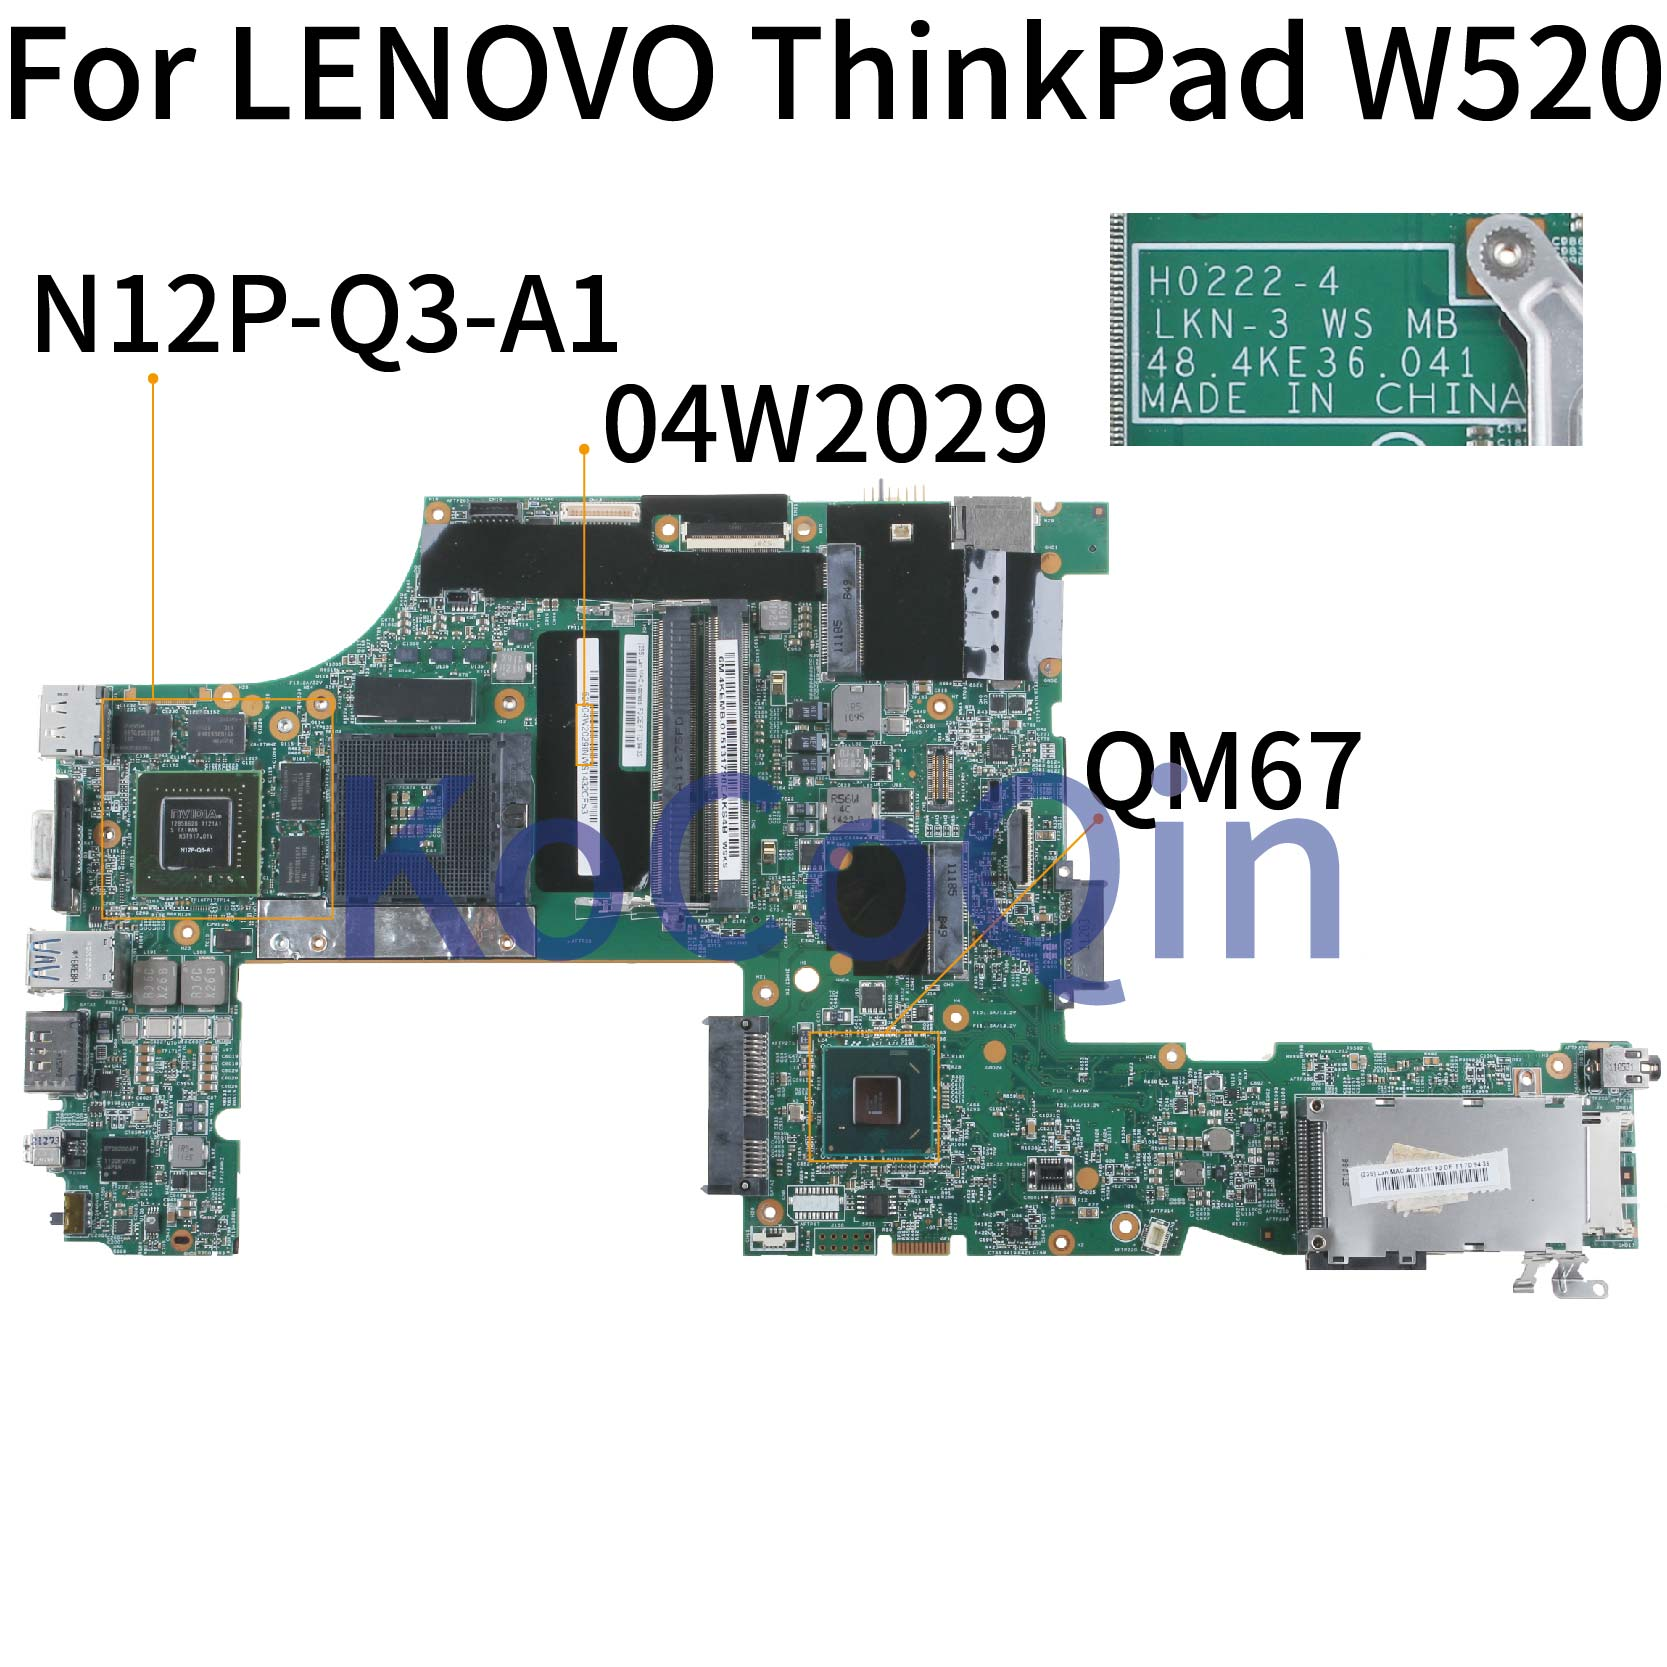 KoCoQin Laptop Motherboard For LENOVO ThinkPad W520 Q2000M Mainboard 04W2029 H0222-4 LKN-3 48.4KE36.041 QM67 N12P-Q3-A1